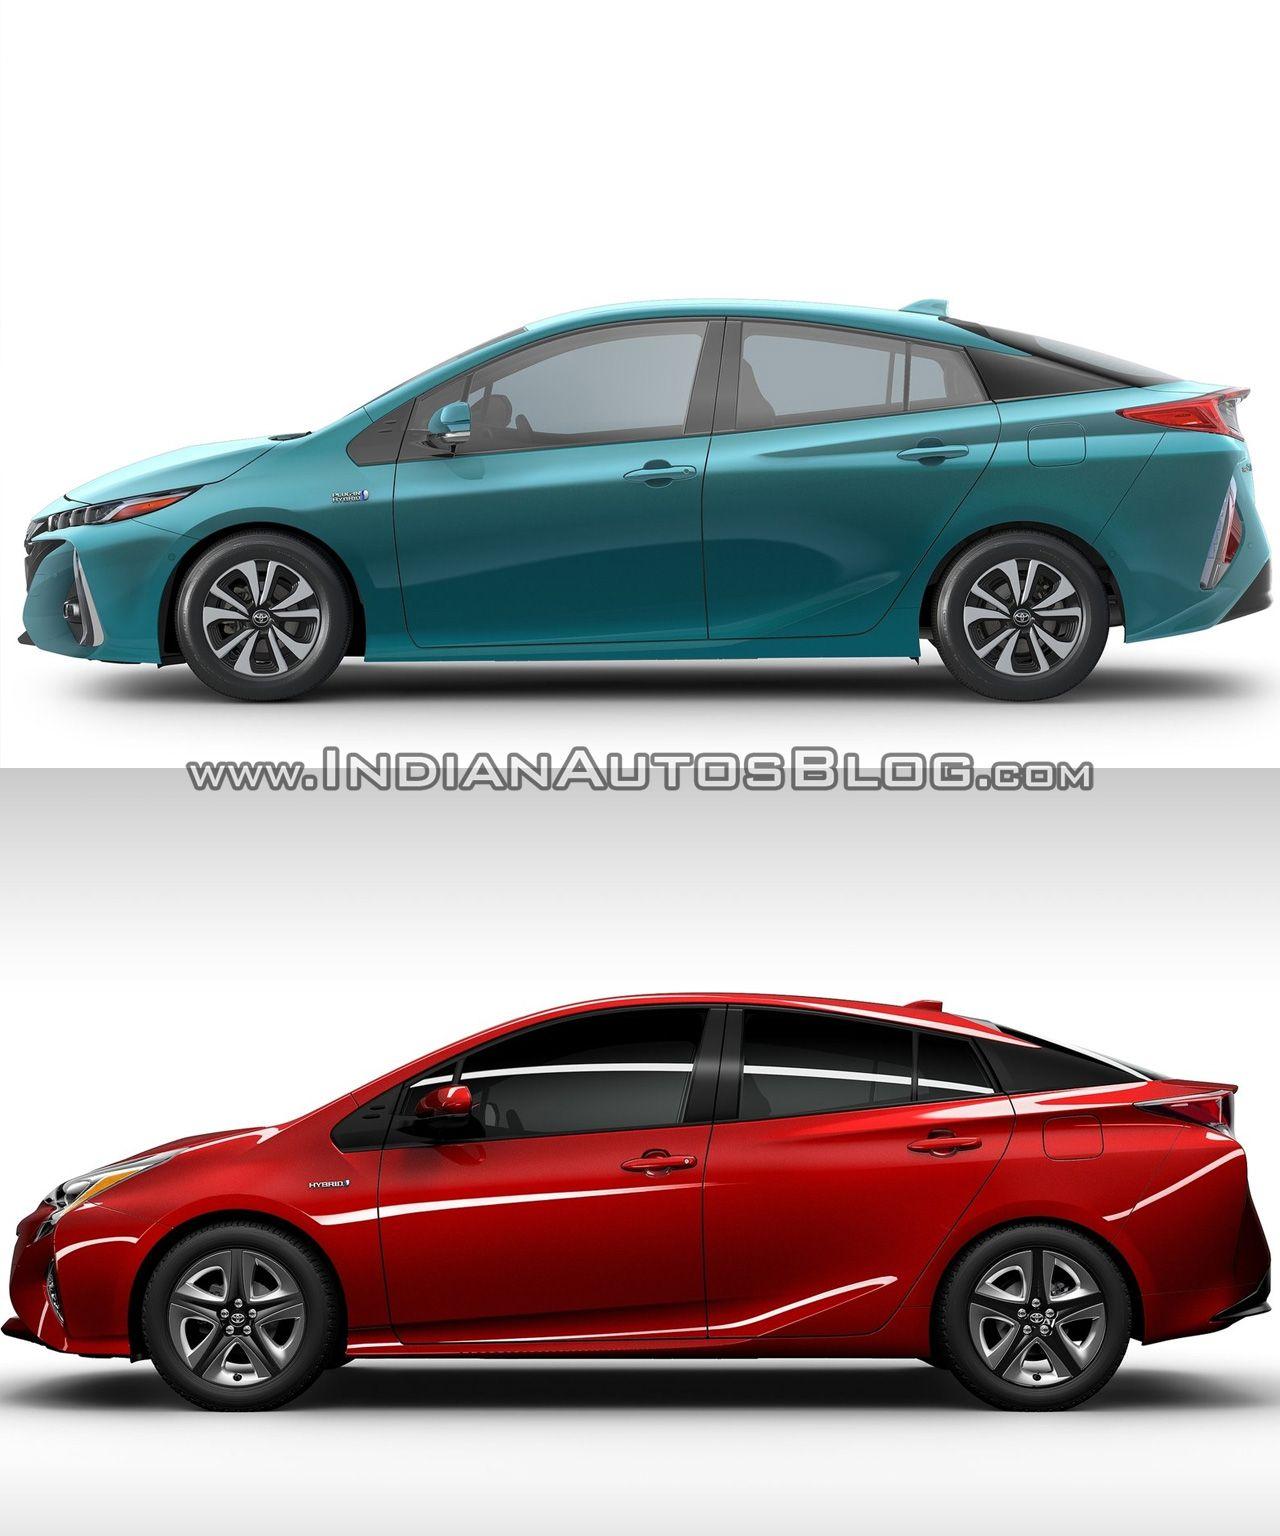 Toyota prius prime side vs 2016 toyota prius side